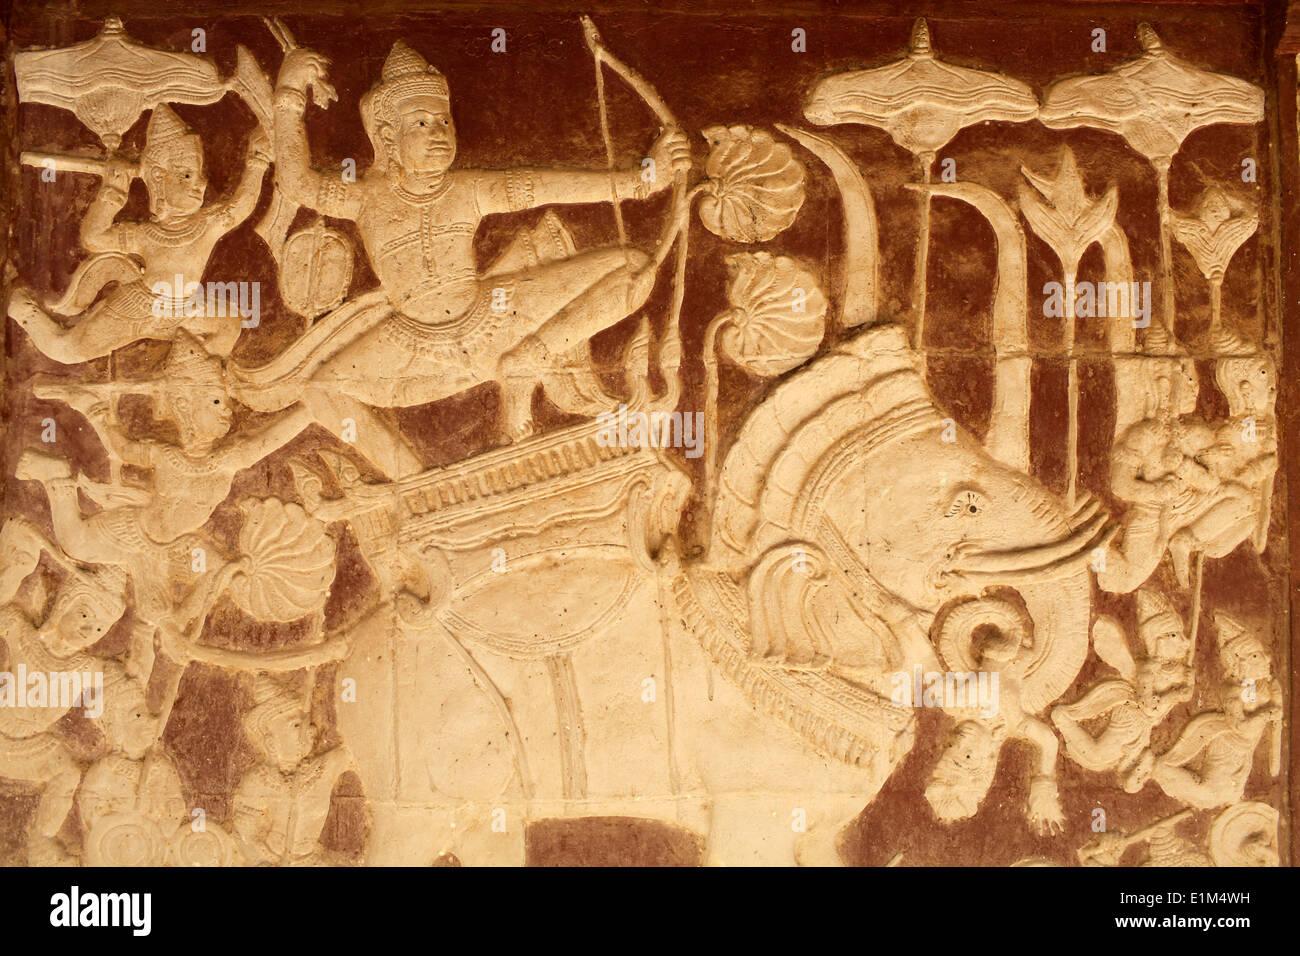 Wat Ounalom : sculpture depicting a battle scene from the Ramayana - Stock Image